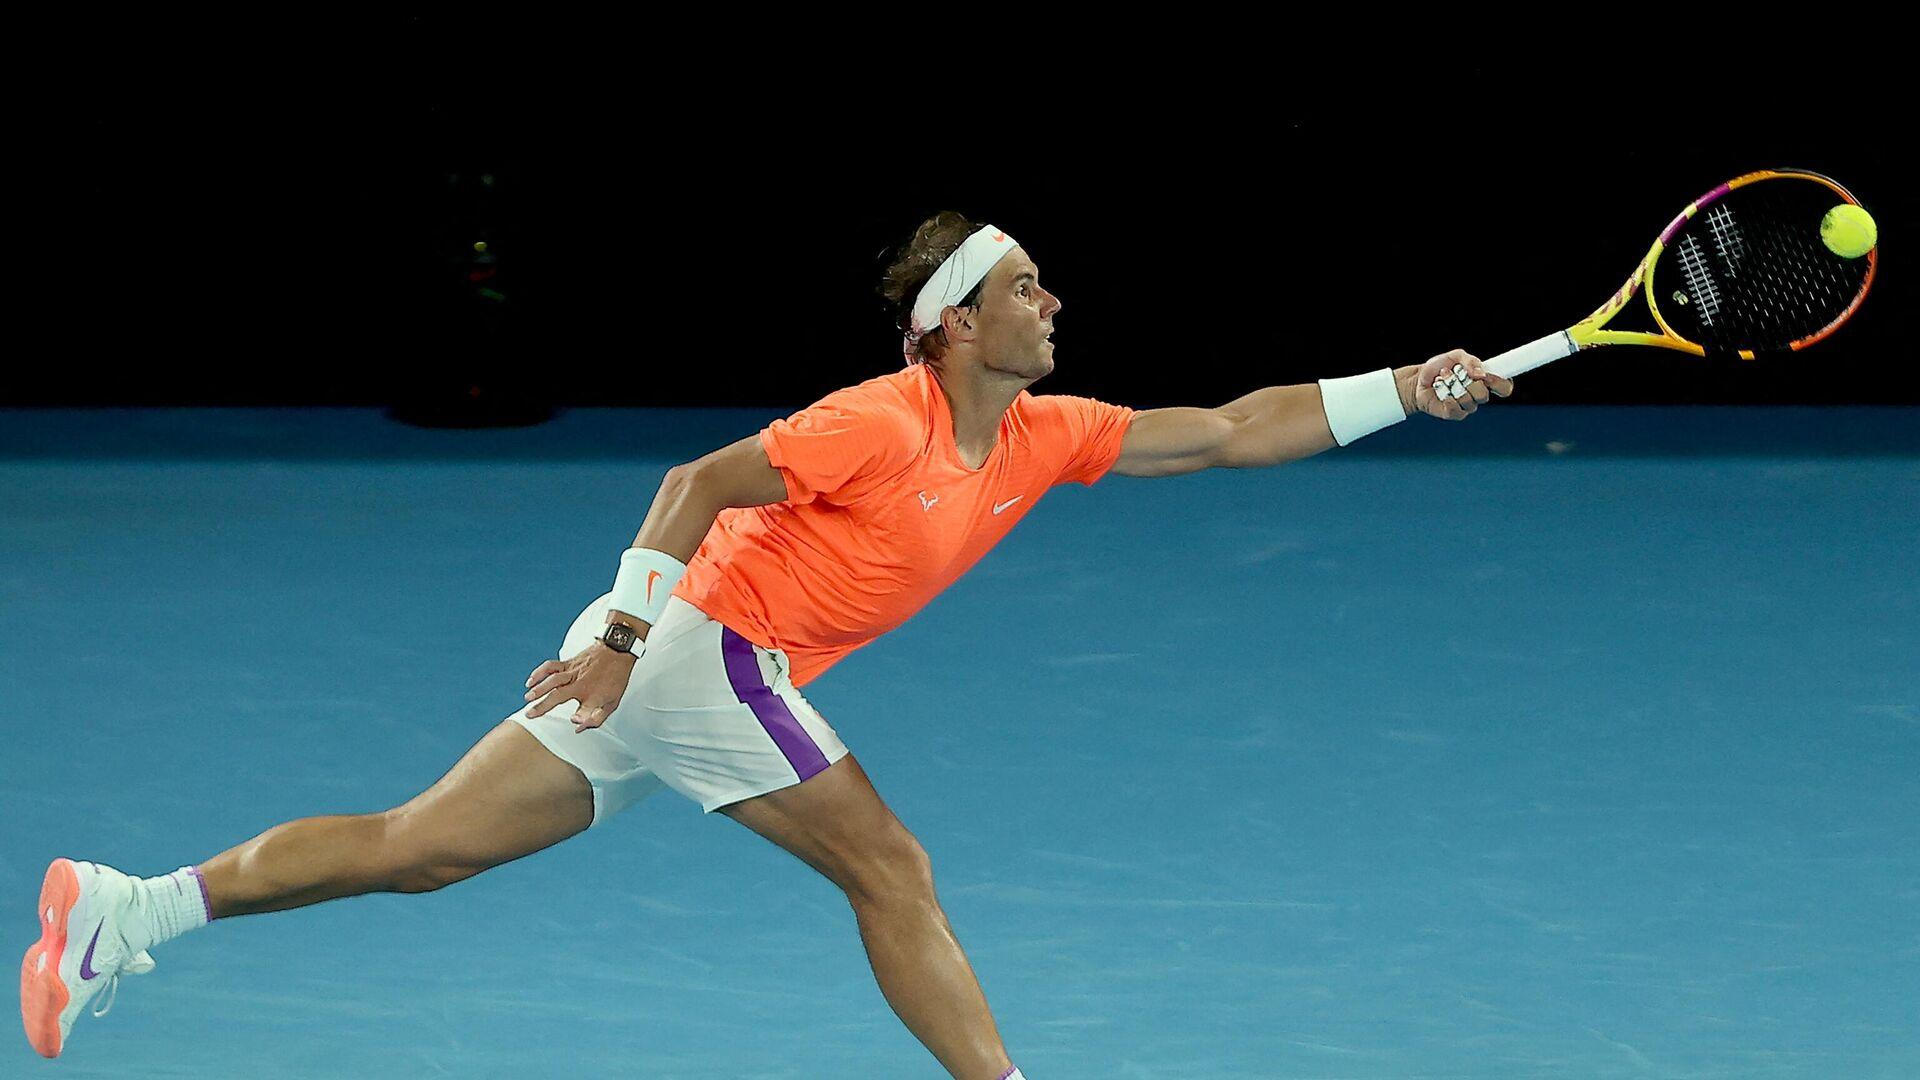 Rafa Nadal durante el partido de cuartos del Open de Australia 2021 ante Tsitsipas - Sputnik Mundo, 1920, 17.06.2021